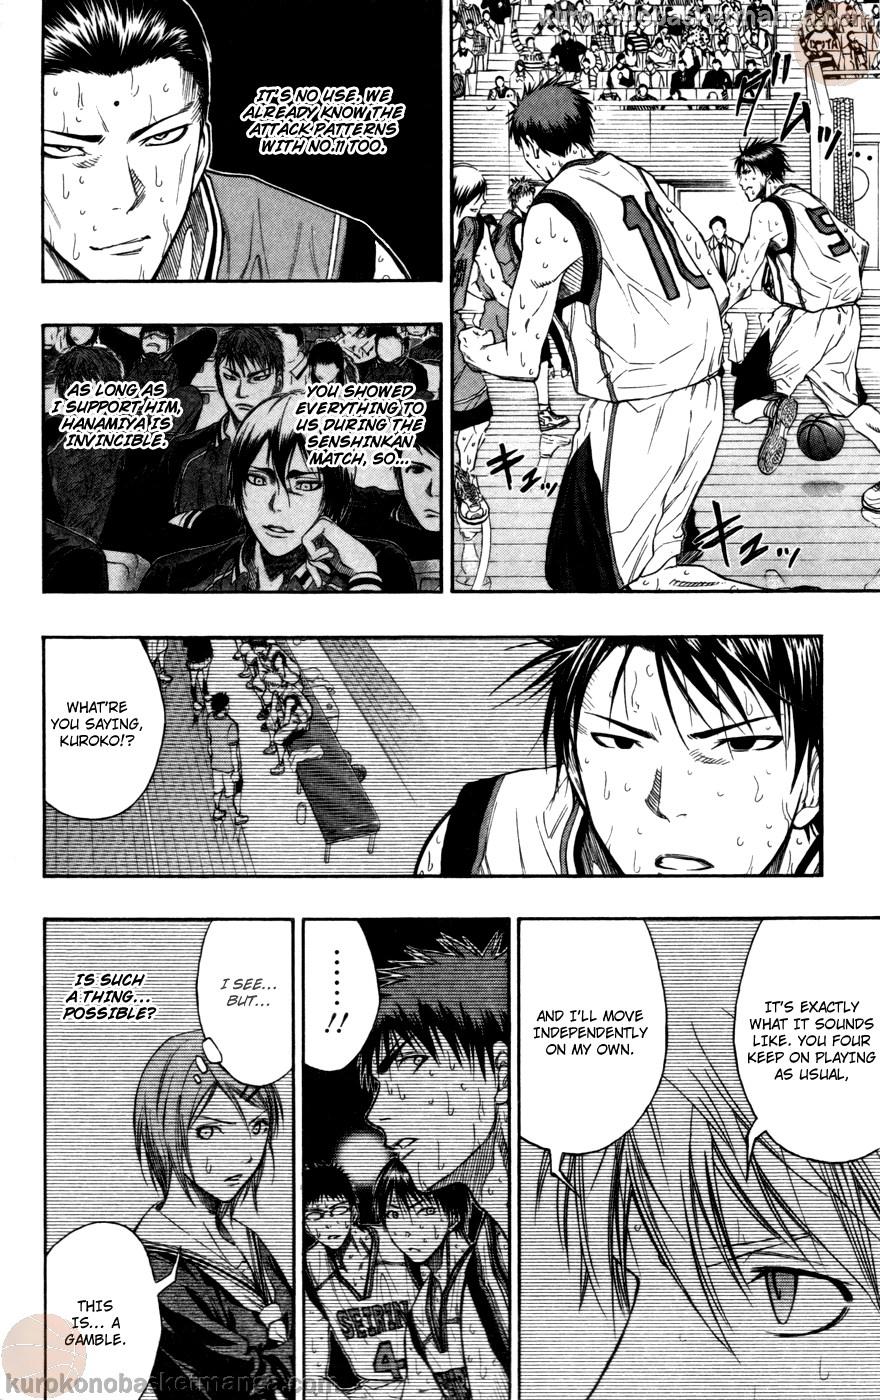 Kuroko no Basket Manga Chapter 105 - Image 07